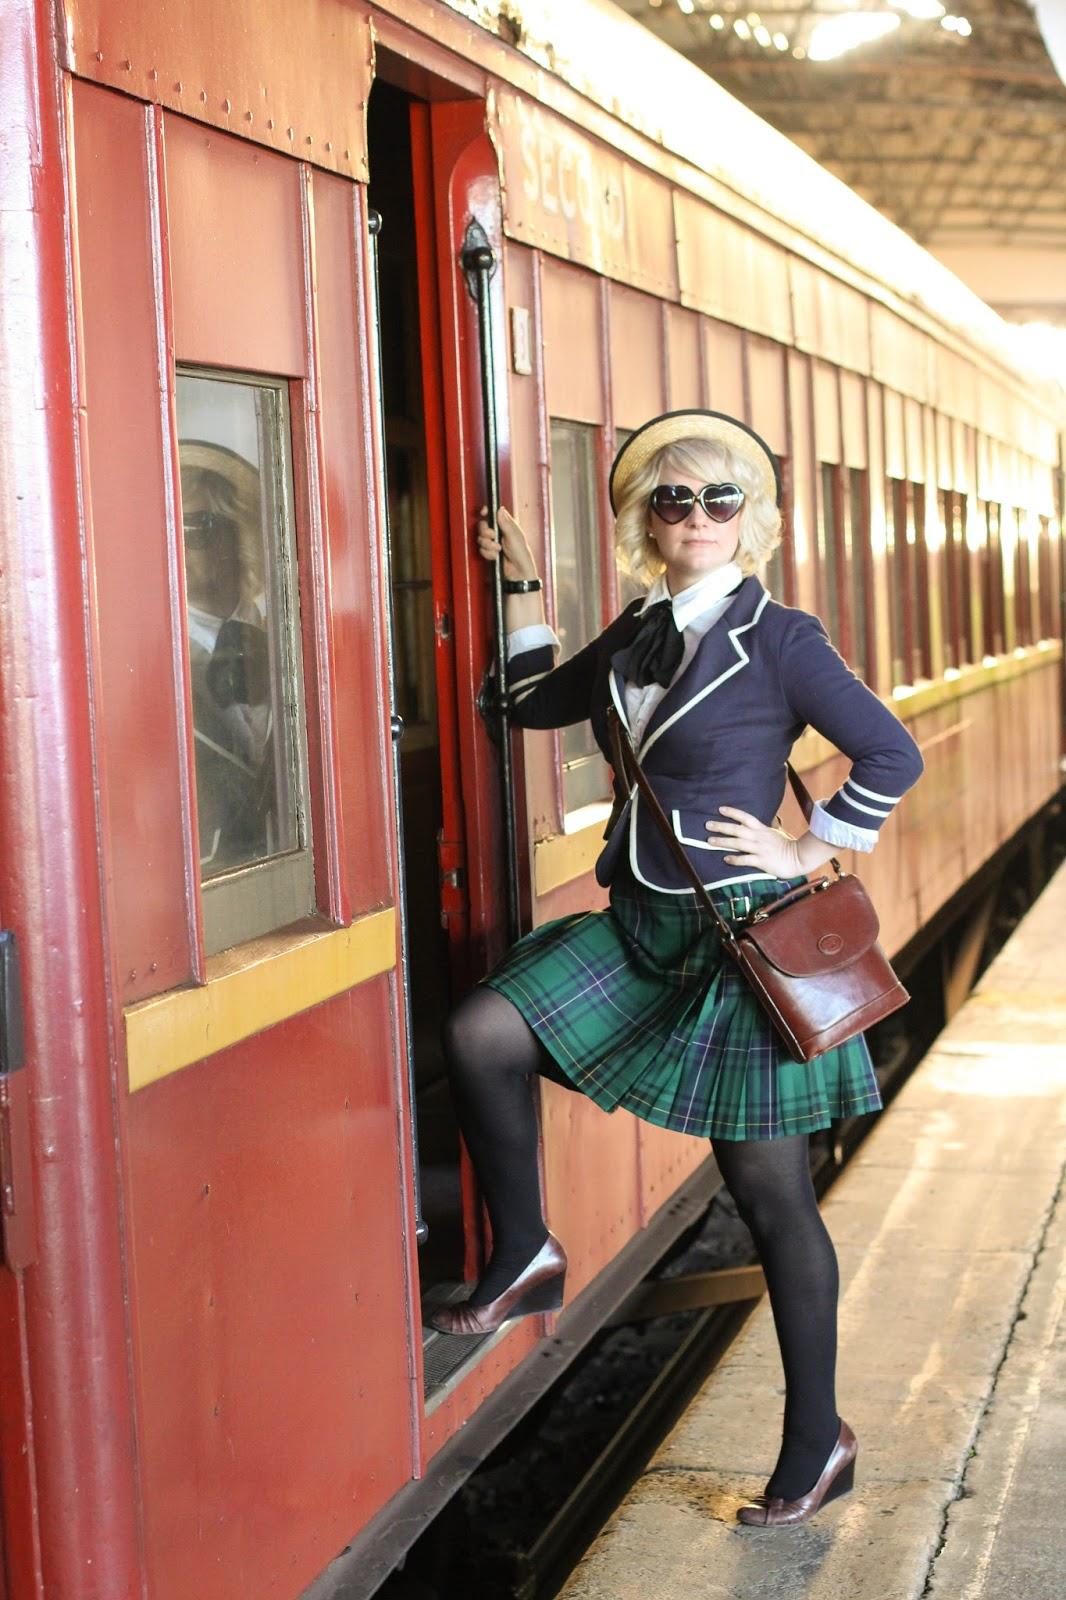 Liana of Finding Femme wears navy Modcloth Academia Ahoy blazer, black necktie, straw boater, green tartan school skirt at Ballarat Train Station for the steam train ride at Ballarat Heritage Weekend.